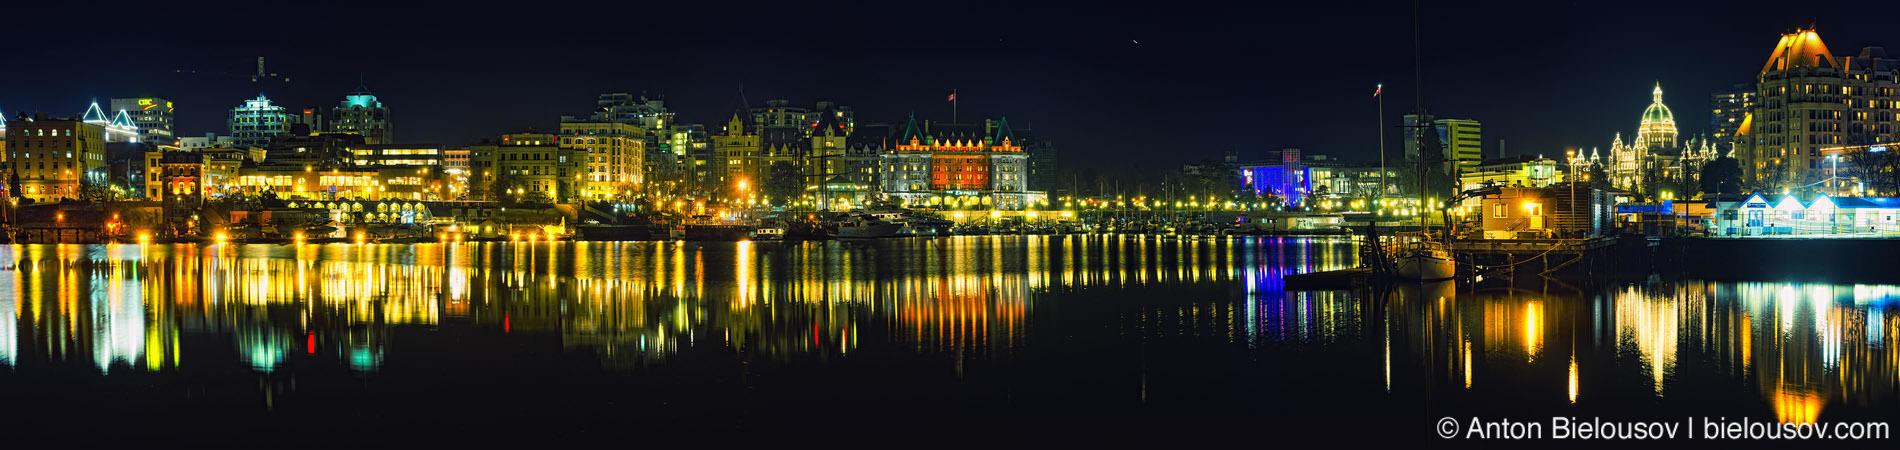 Панораа ночного порта Виктории